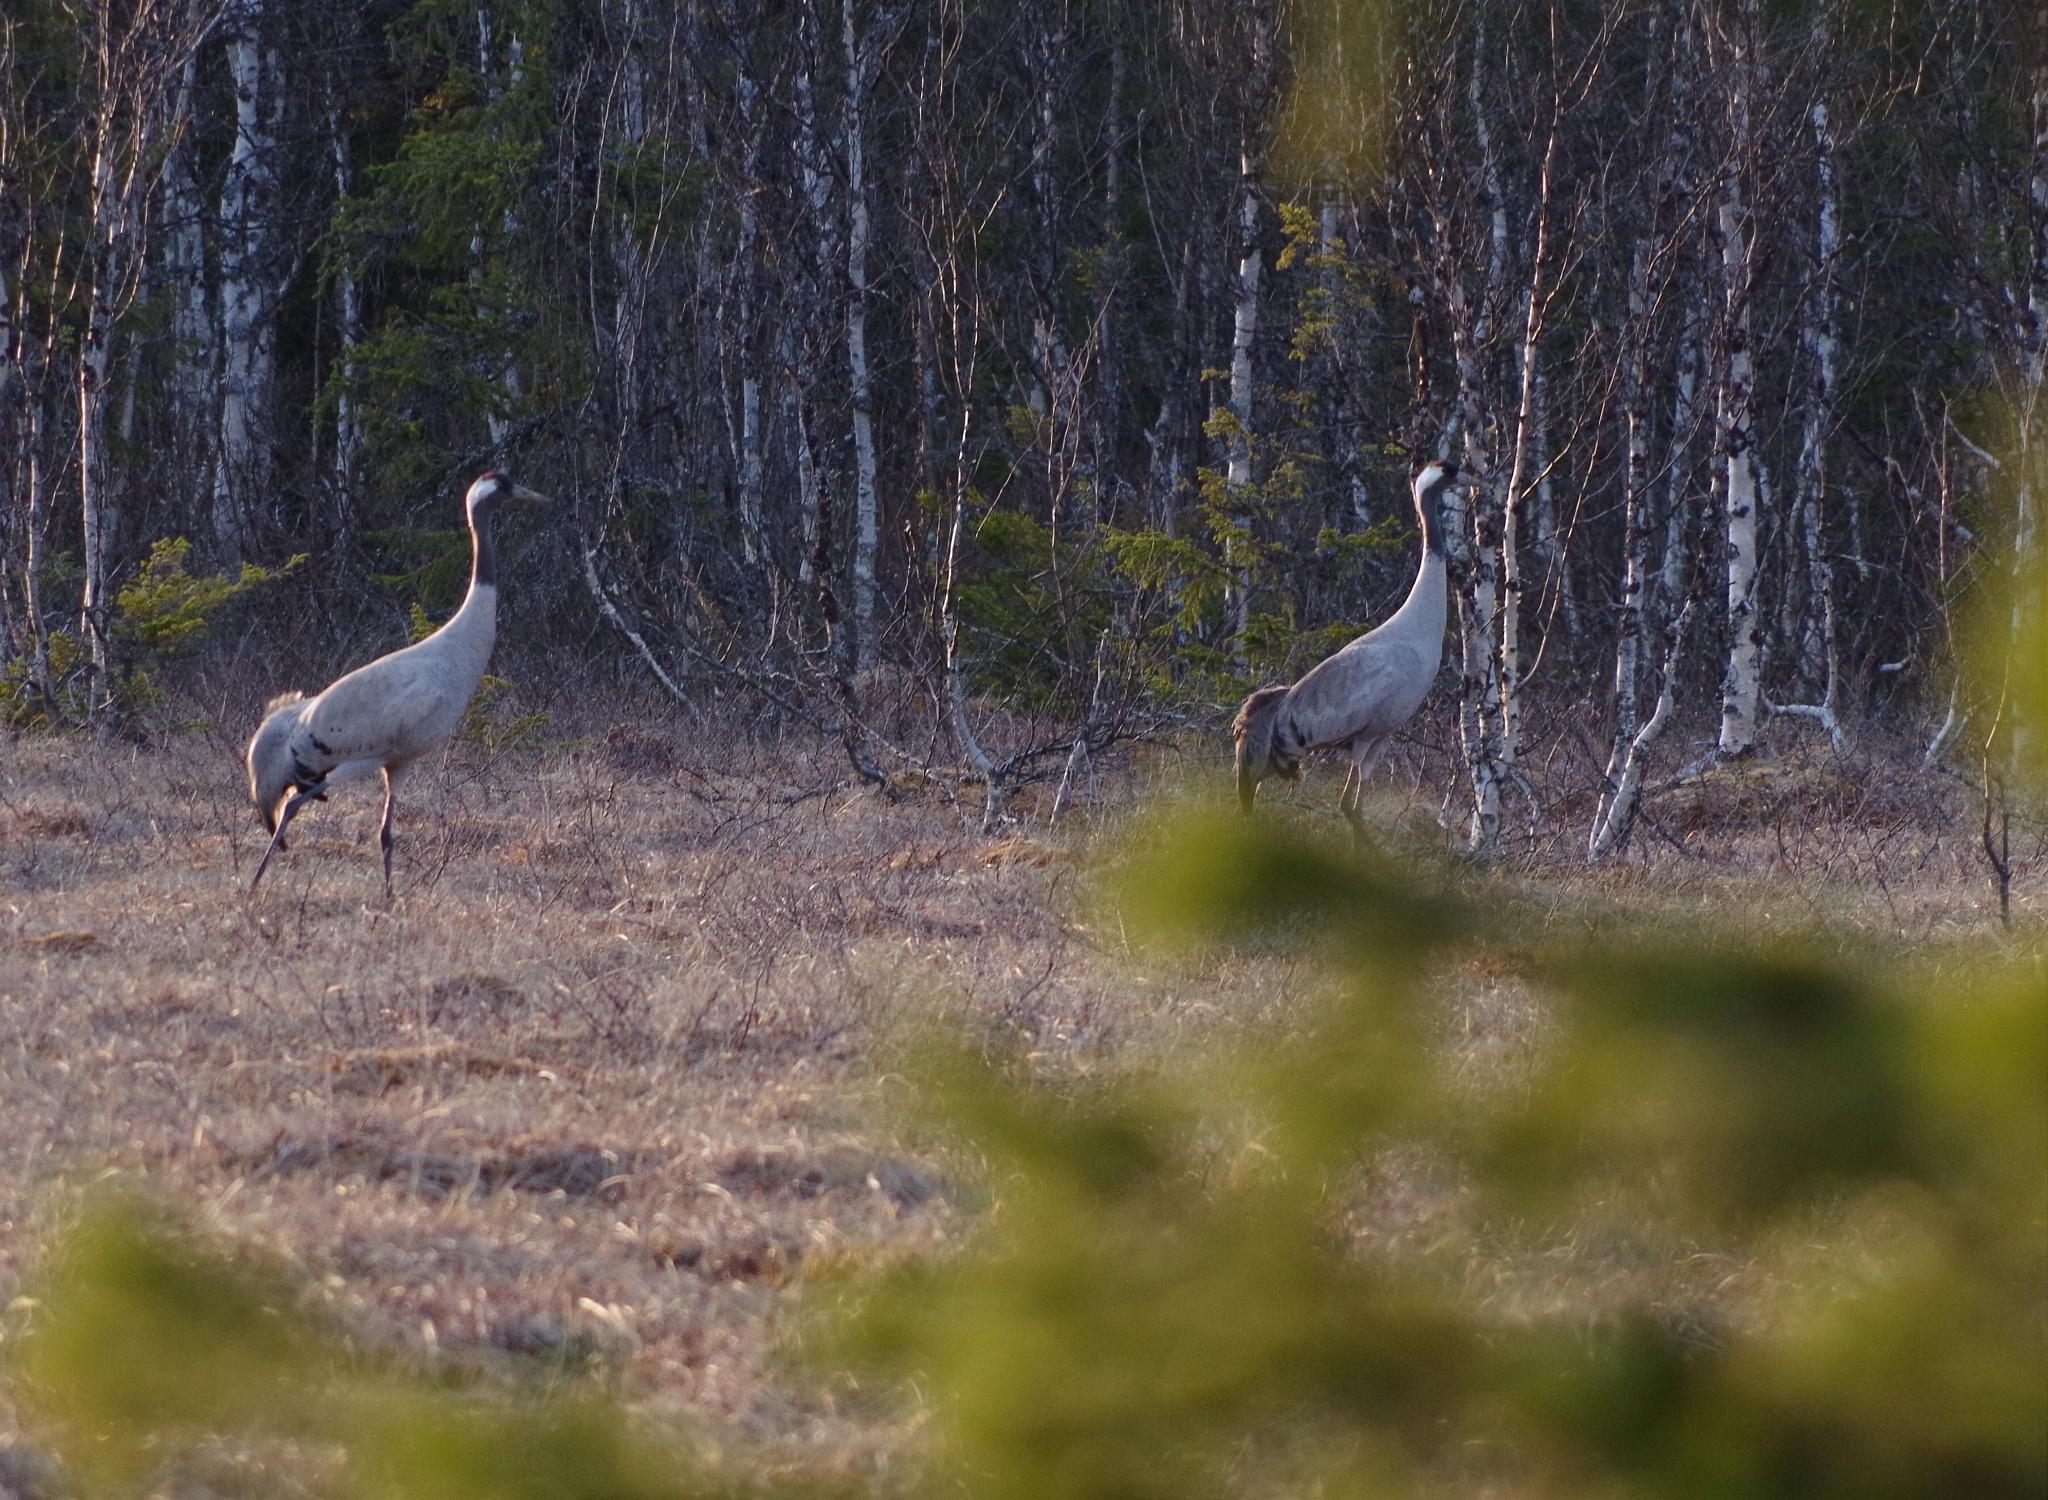 Cranes at lake Gevsjön, Sweden by lundhanders